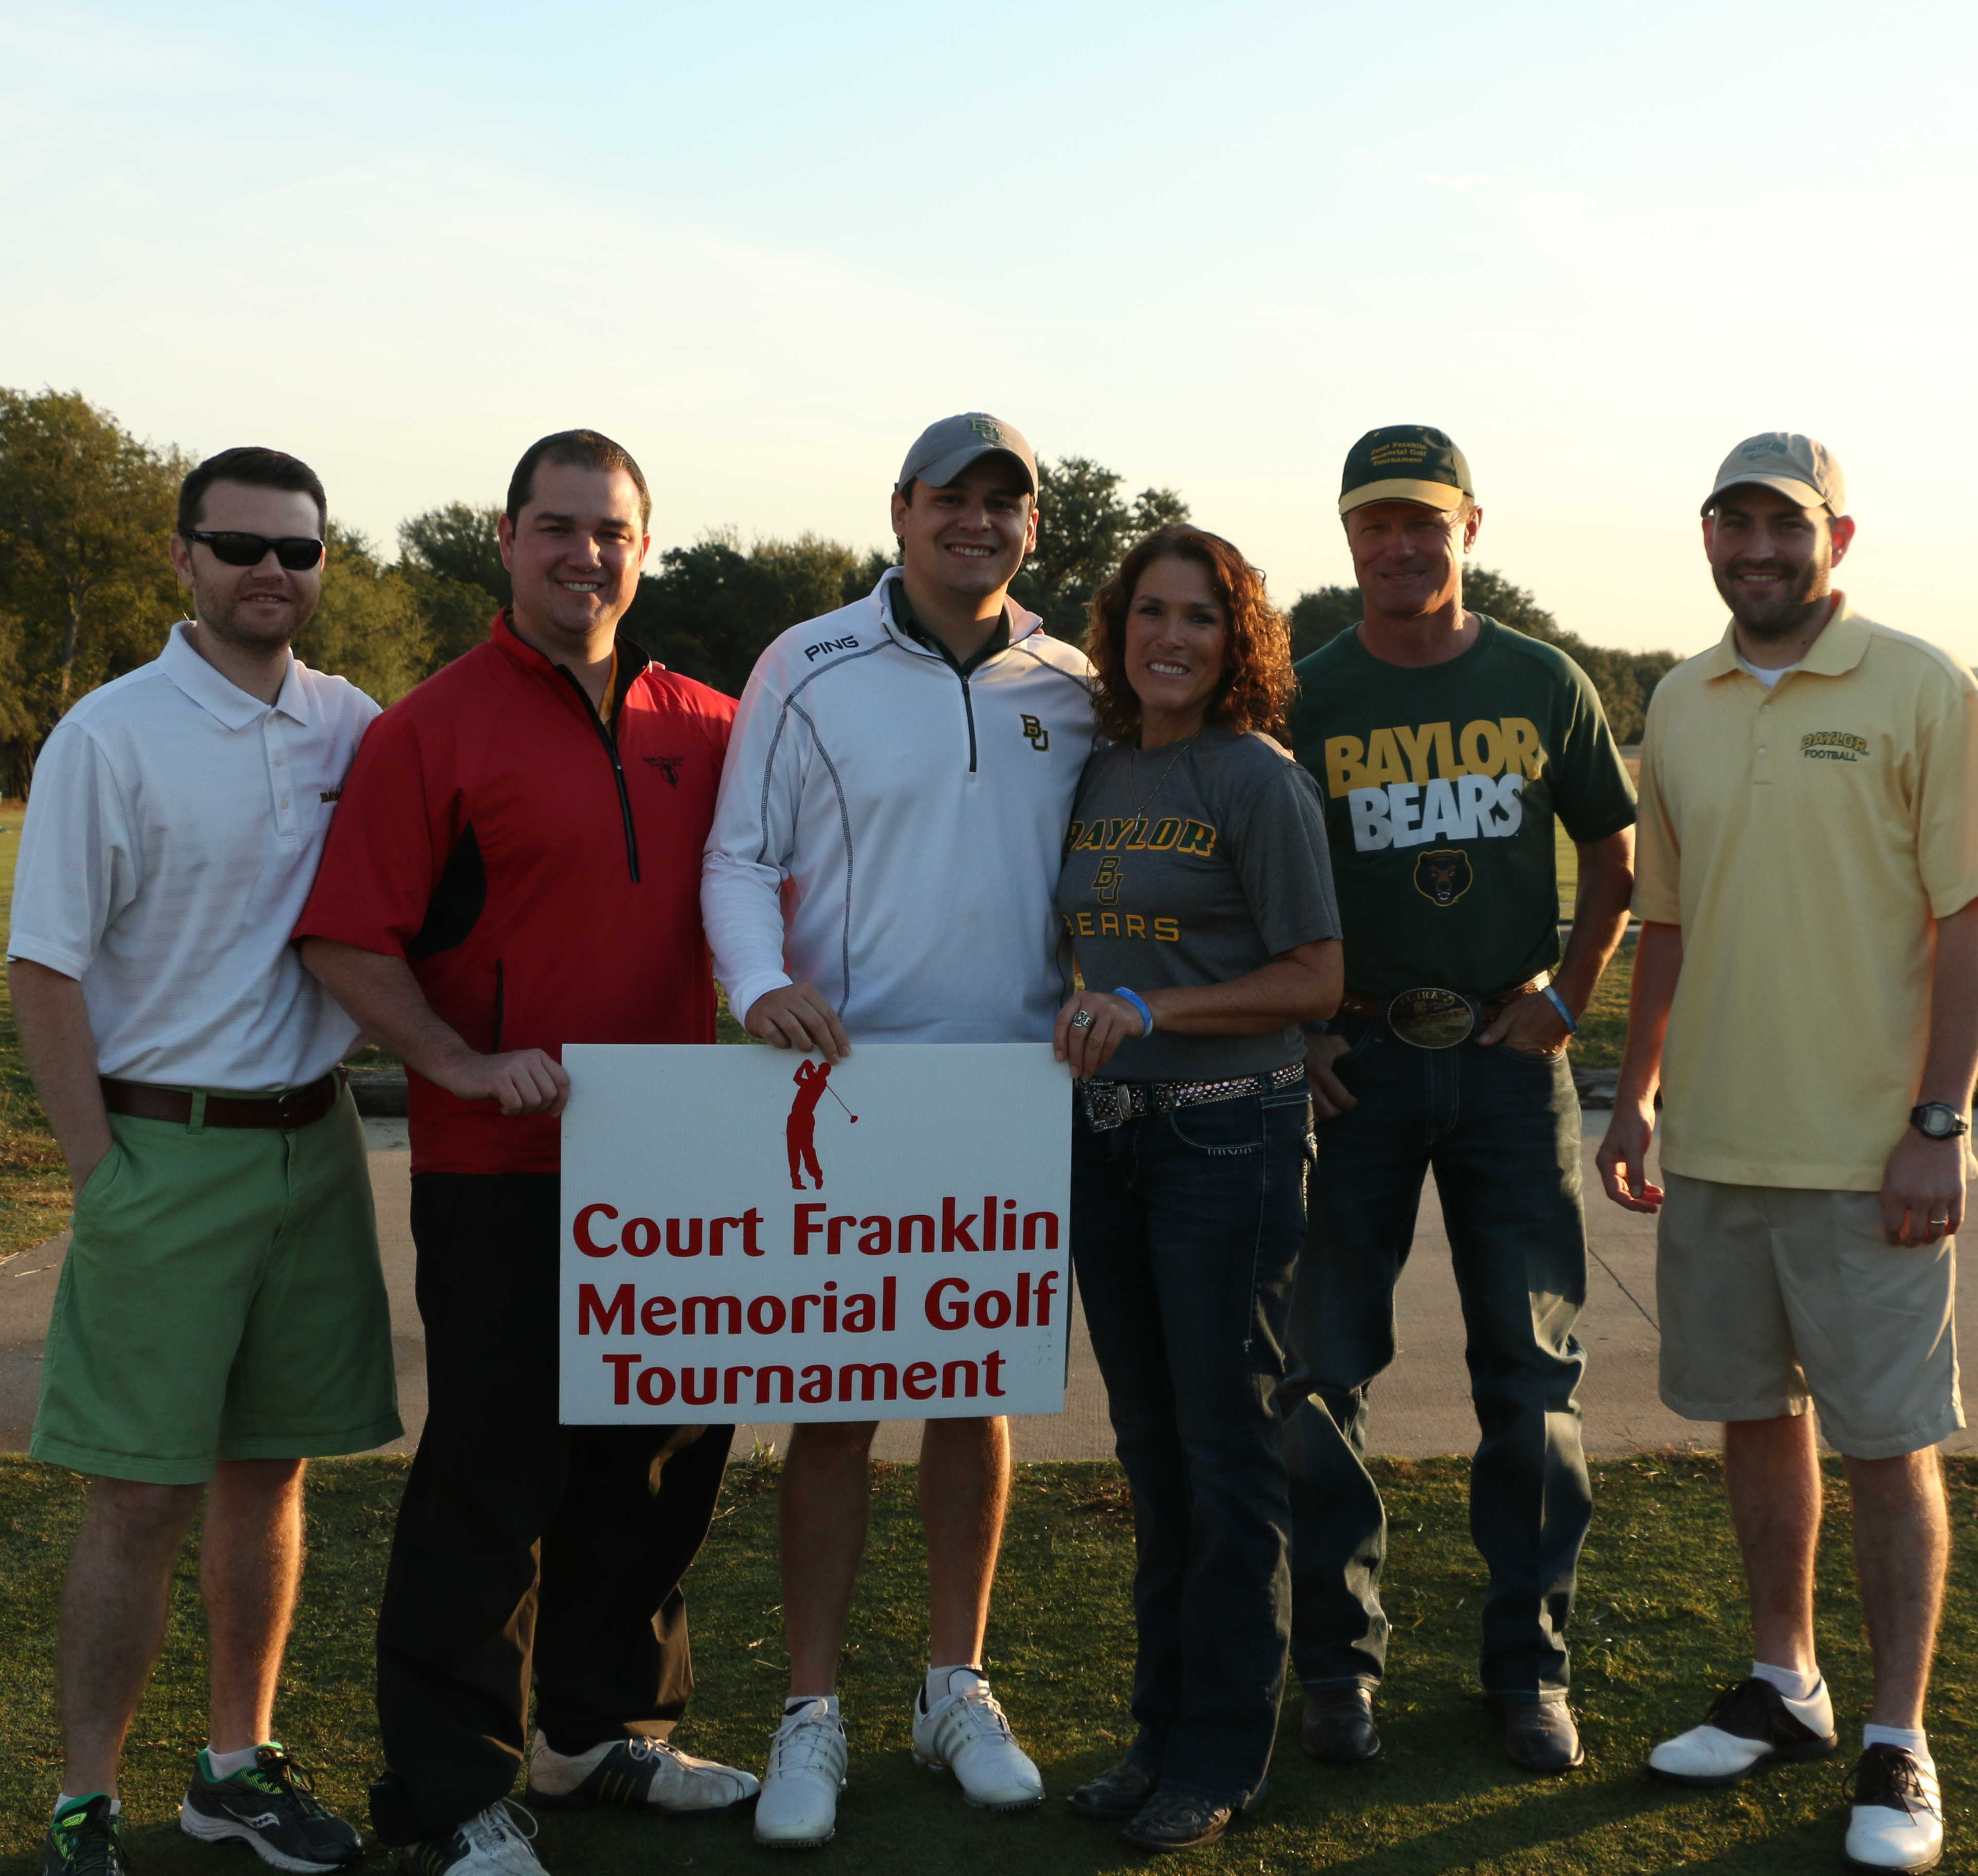 Court Franklin Golf 2015